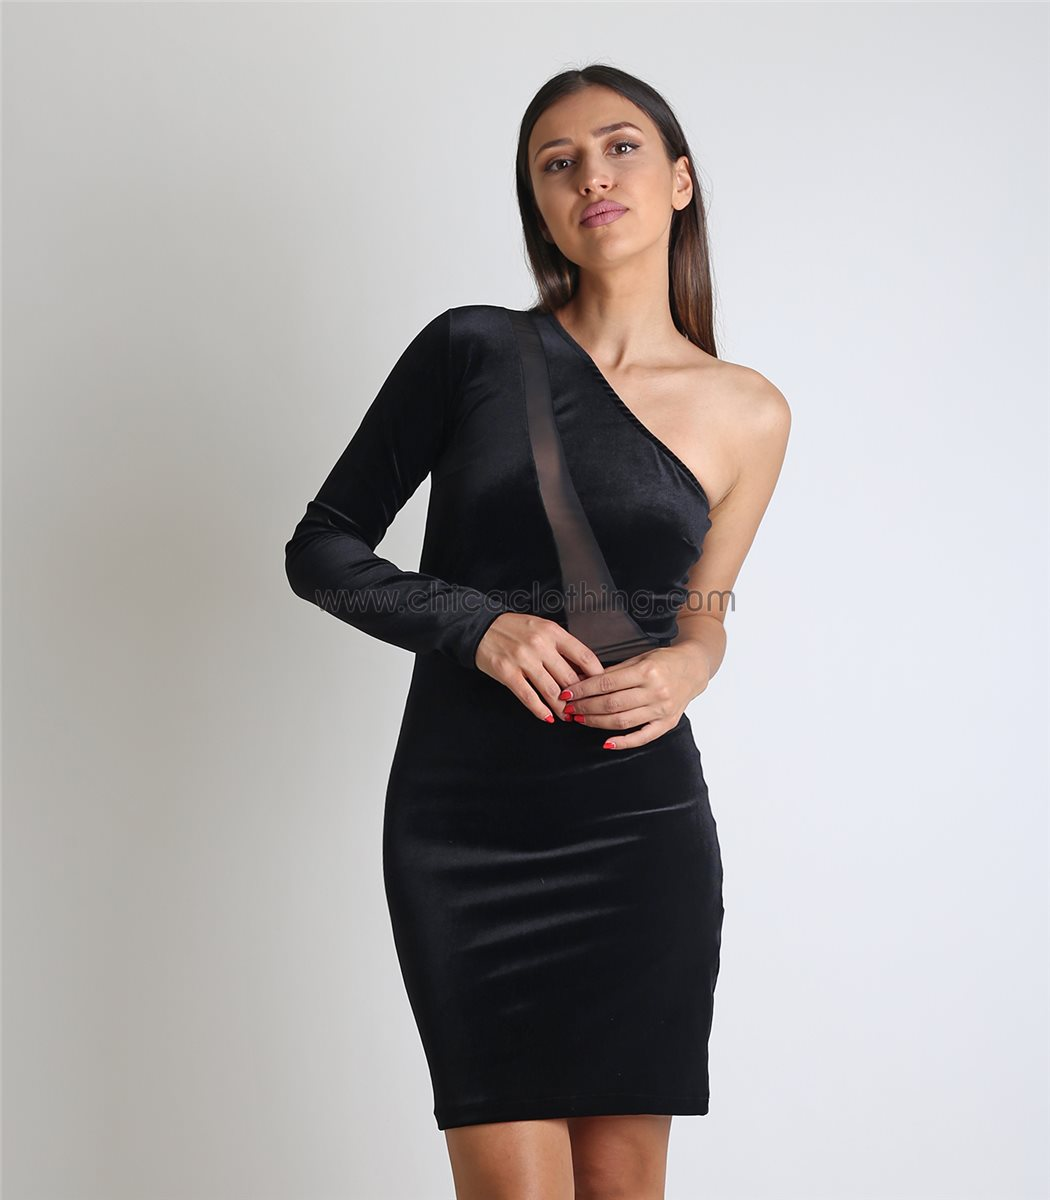 589199371a26 Γυναικείο μαύρο φόρεμα βελούδο με ένα μανίκι και λεπτομέρεια διαφάνεια